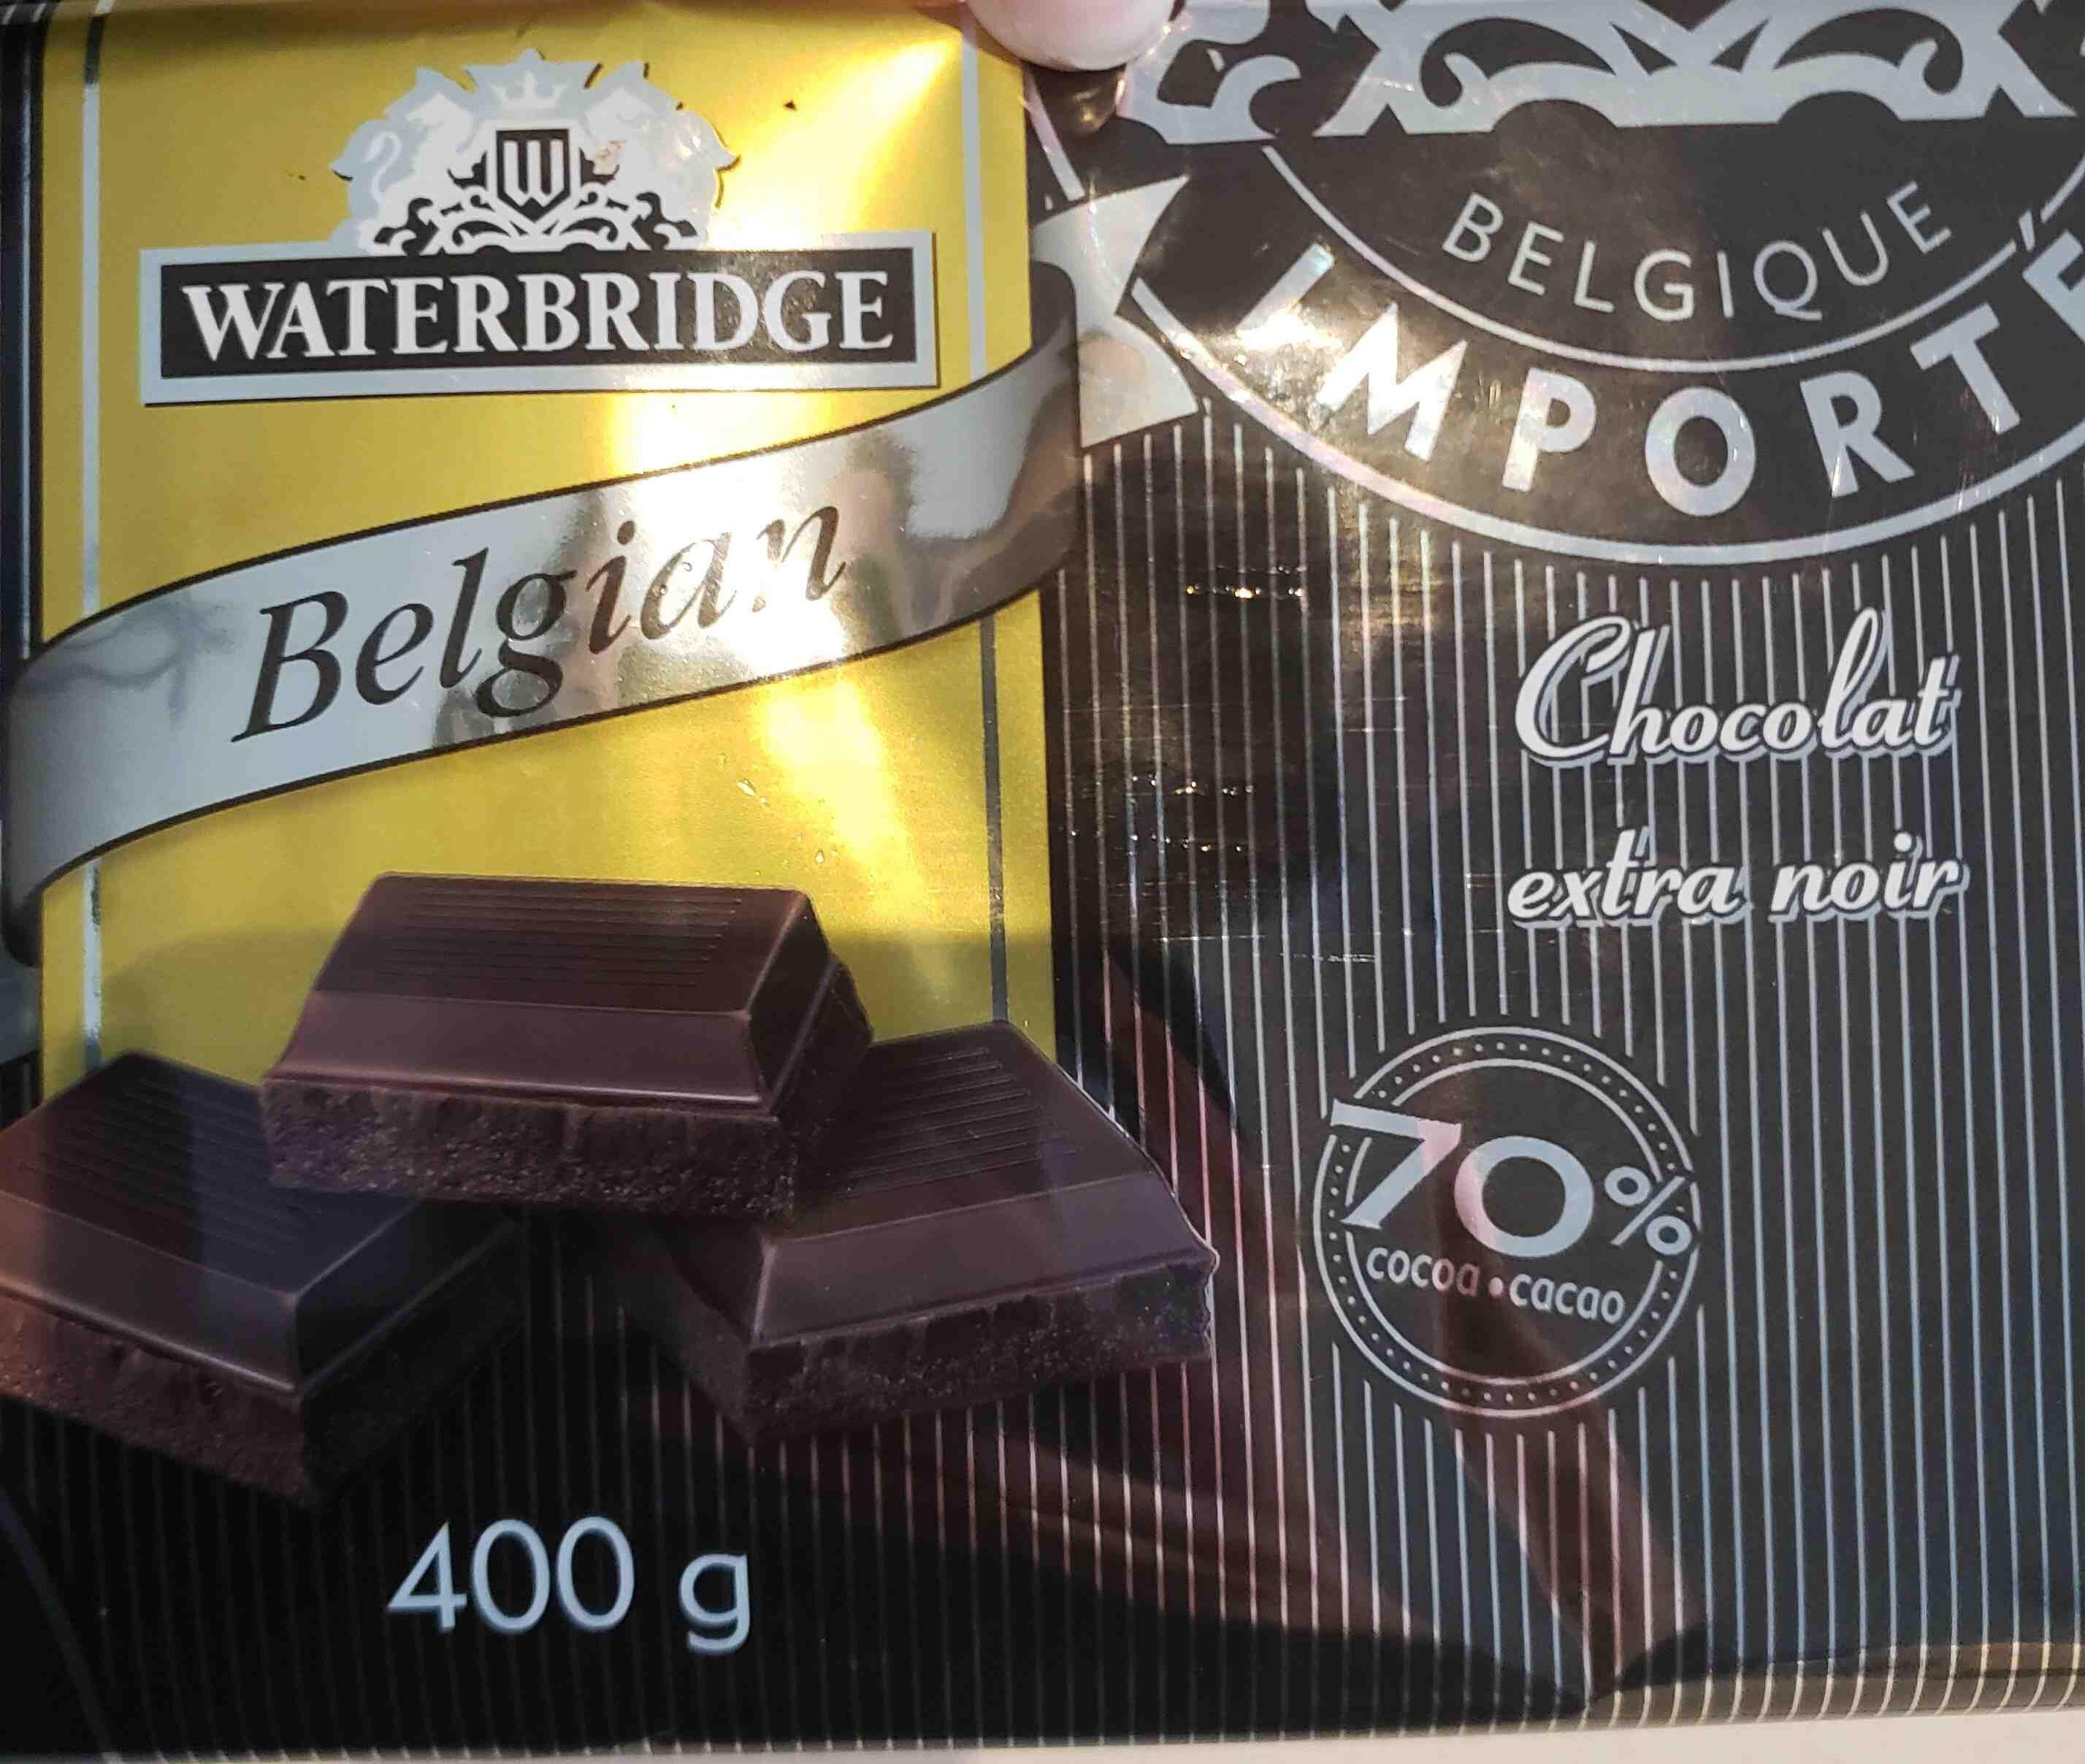 Waterbridge Belgian extra Dark Chocolate - Product